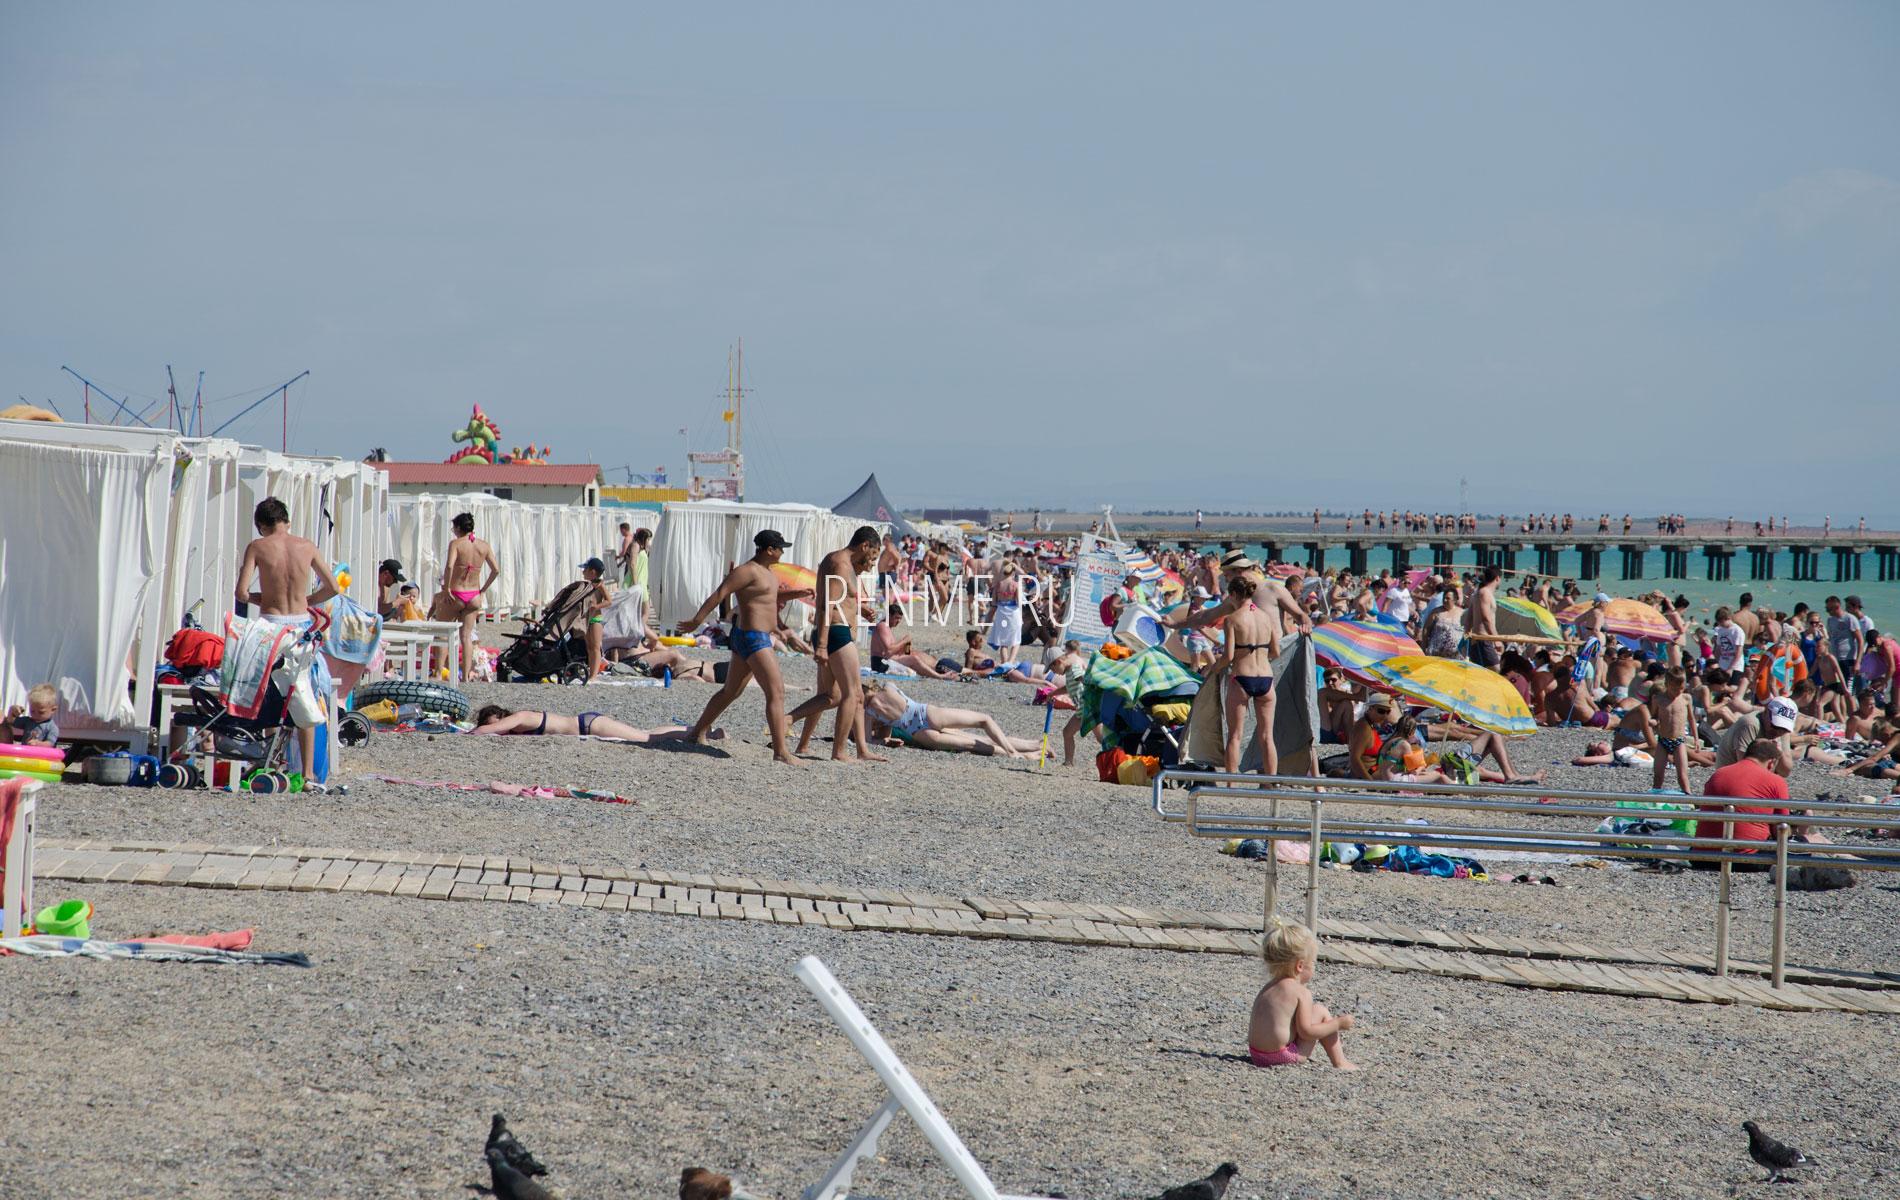 Отдыхающие на пляже. Фото Новофедоровки